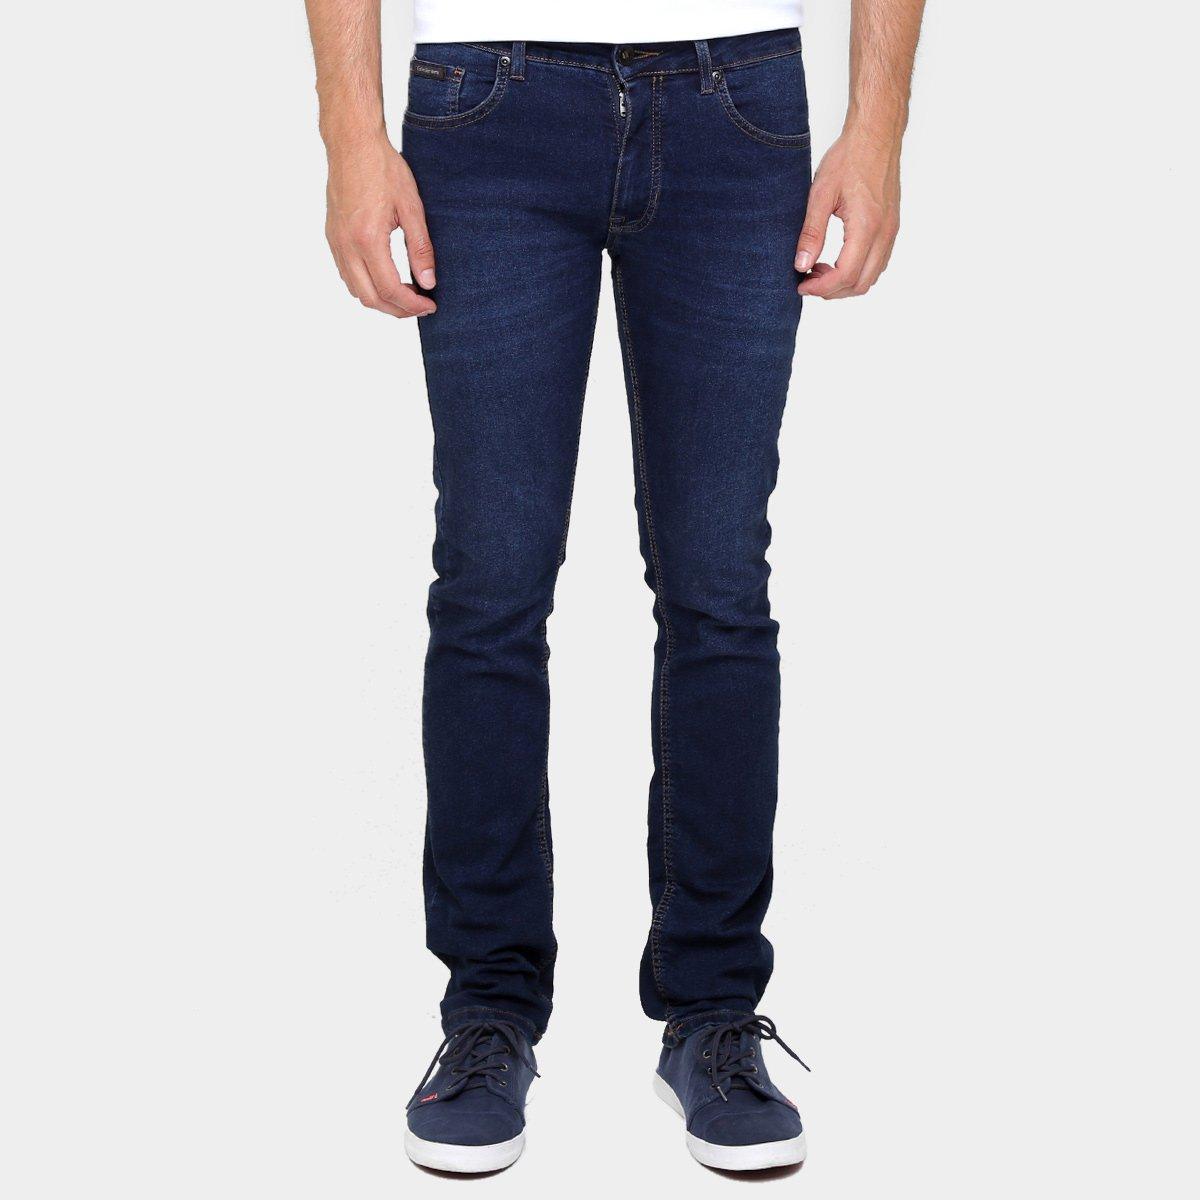 4646cb0cbb7ef Calça Calvin Klein Slim Straight - Compre Agora   Zattini